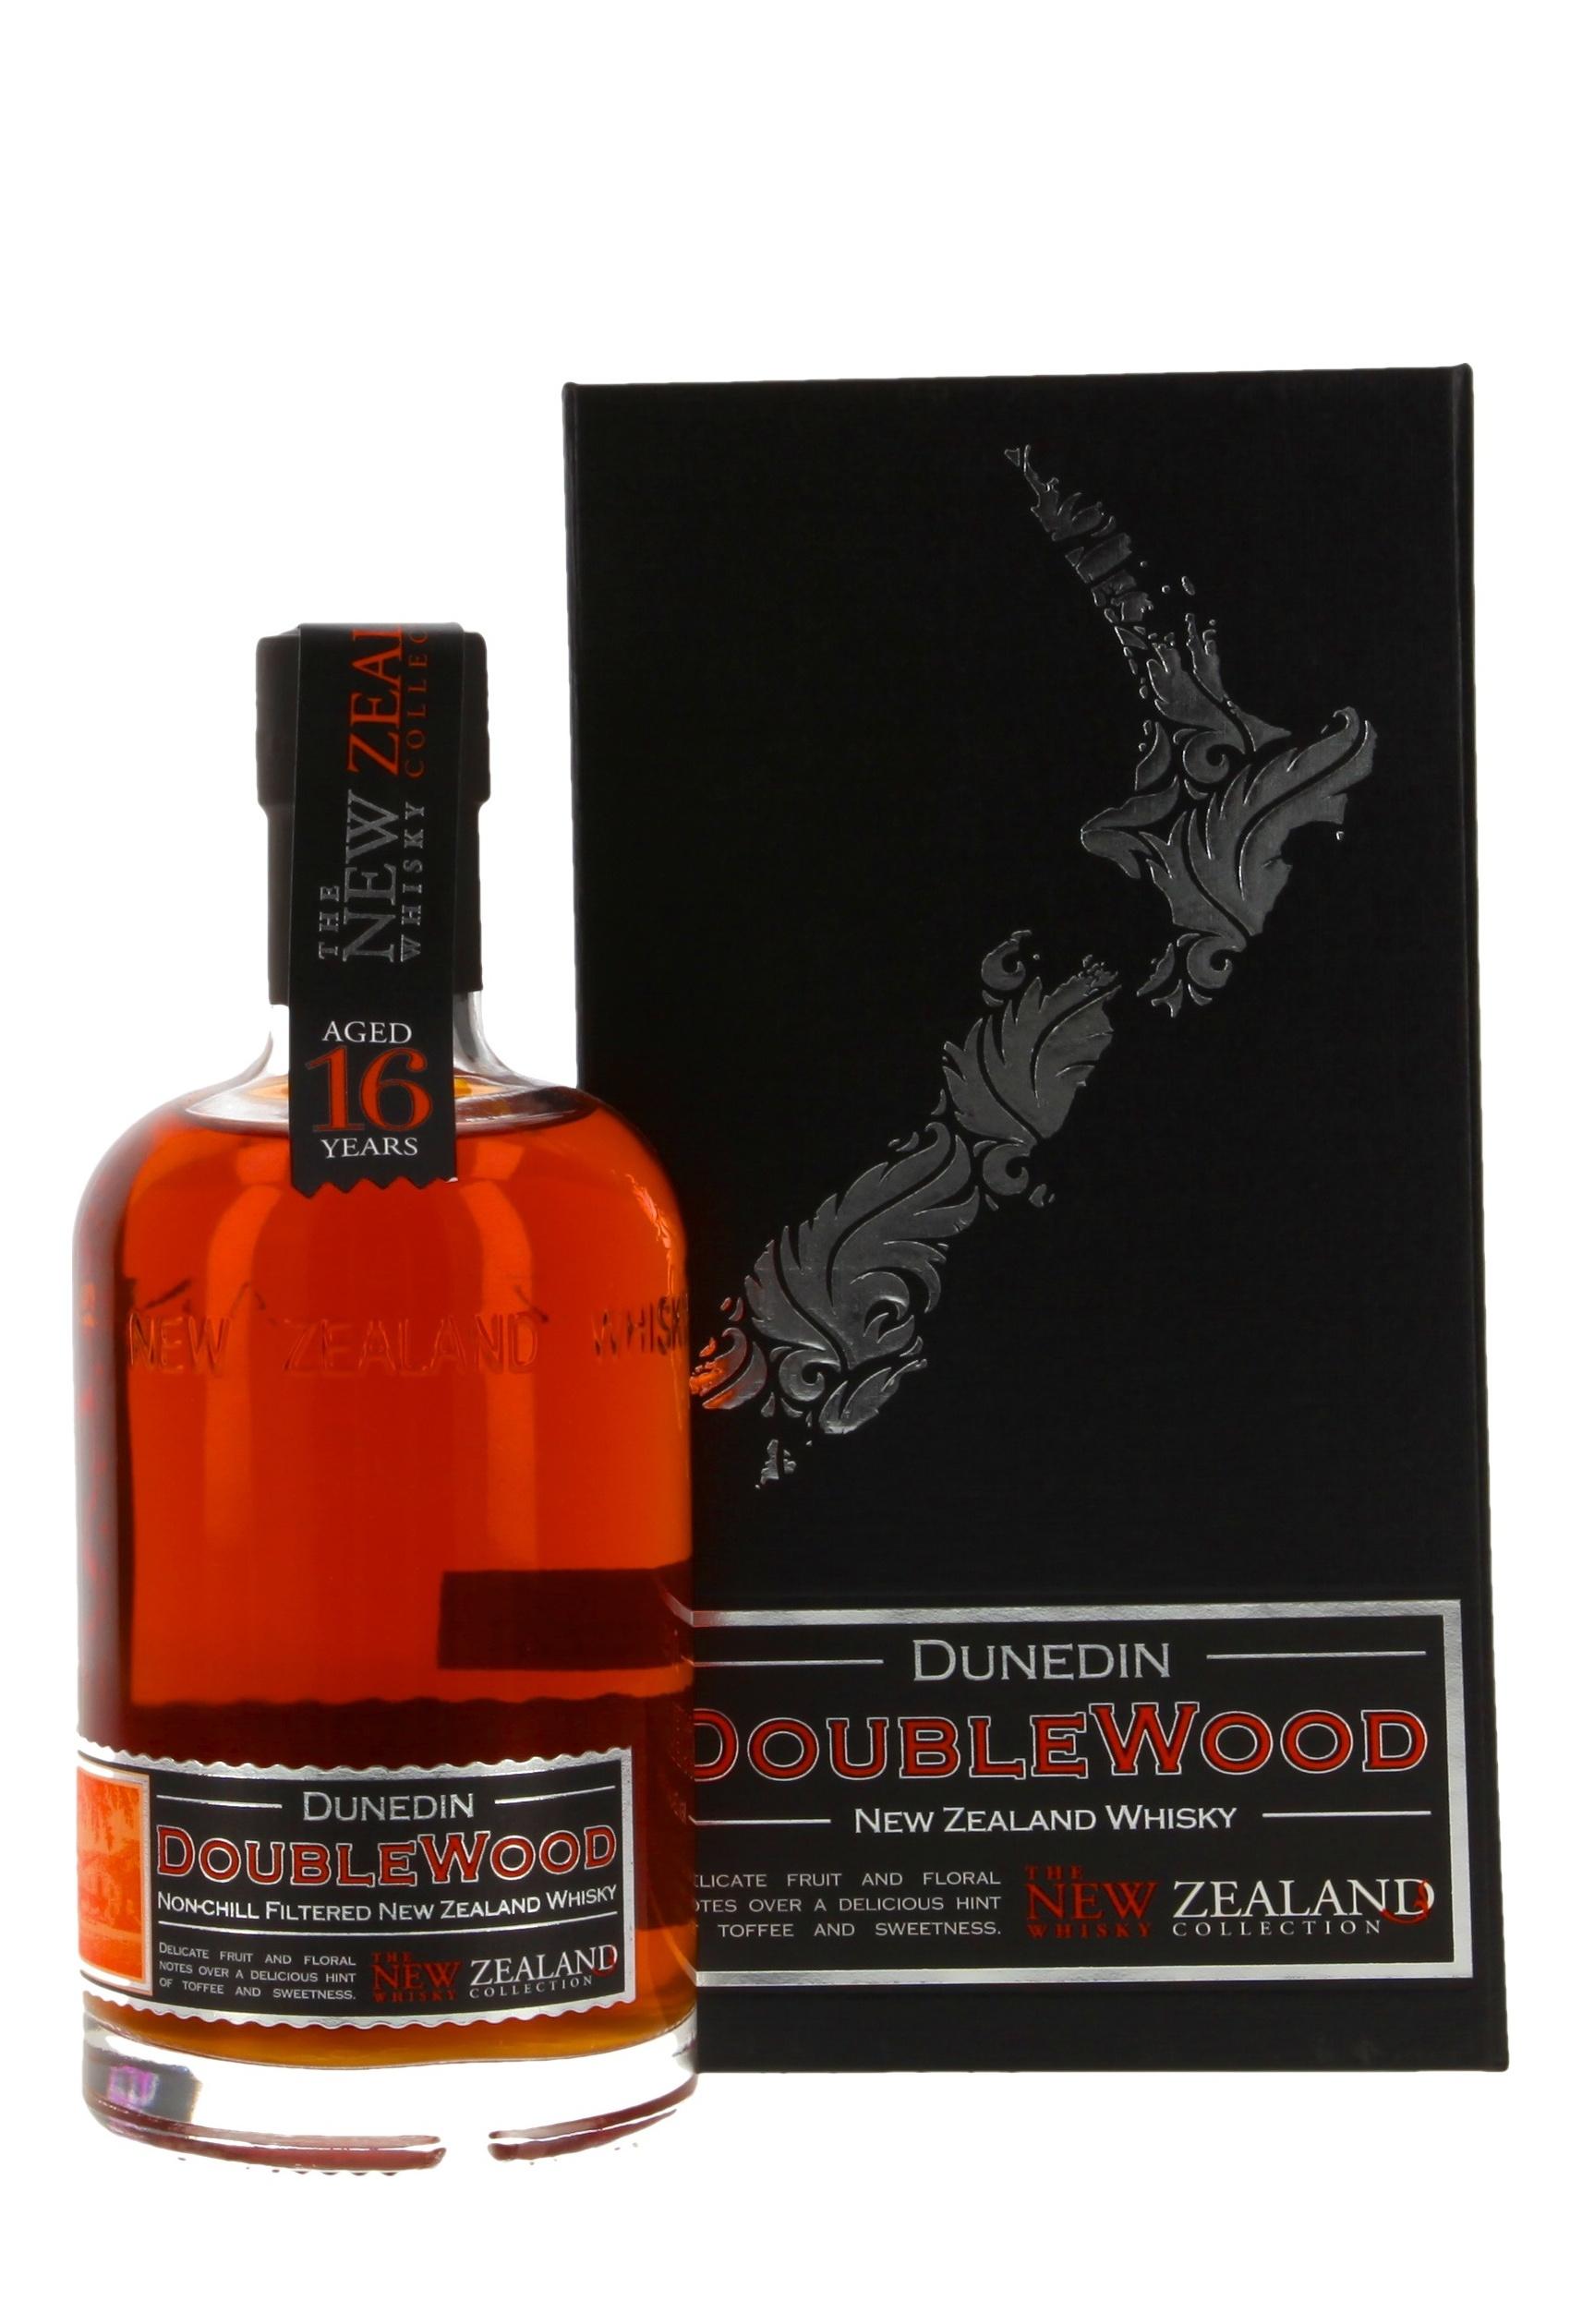 The New Zealand Double Wood